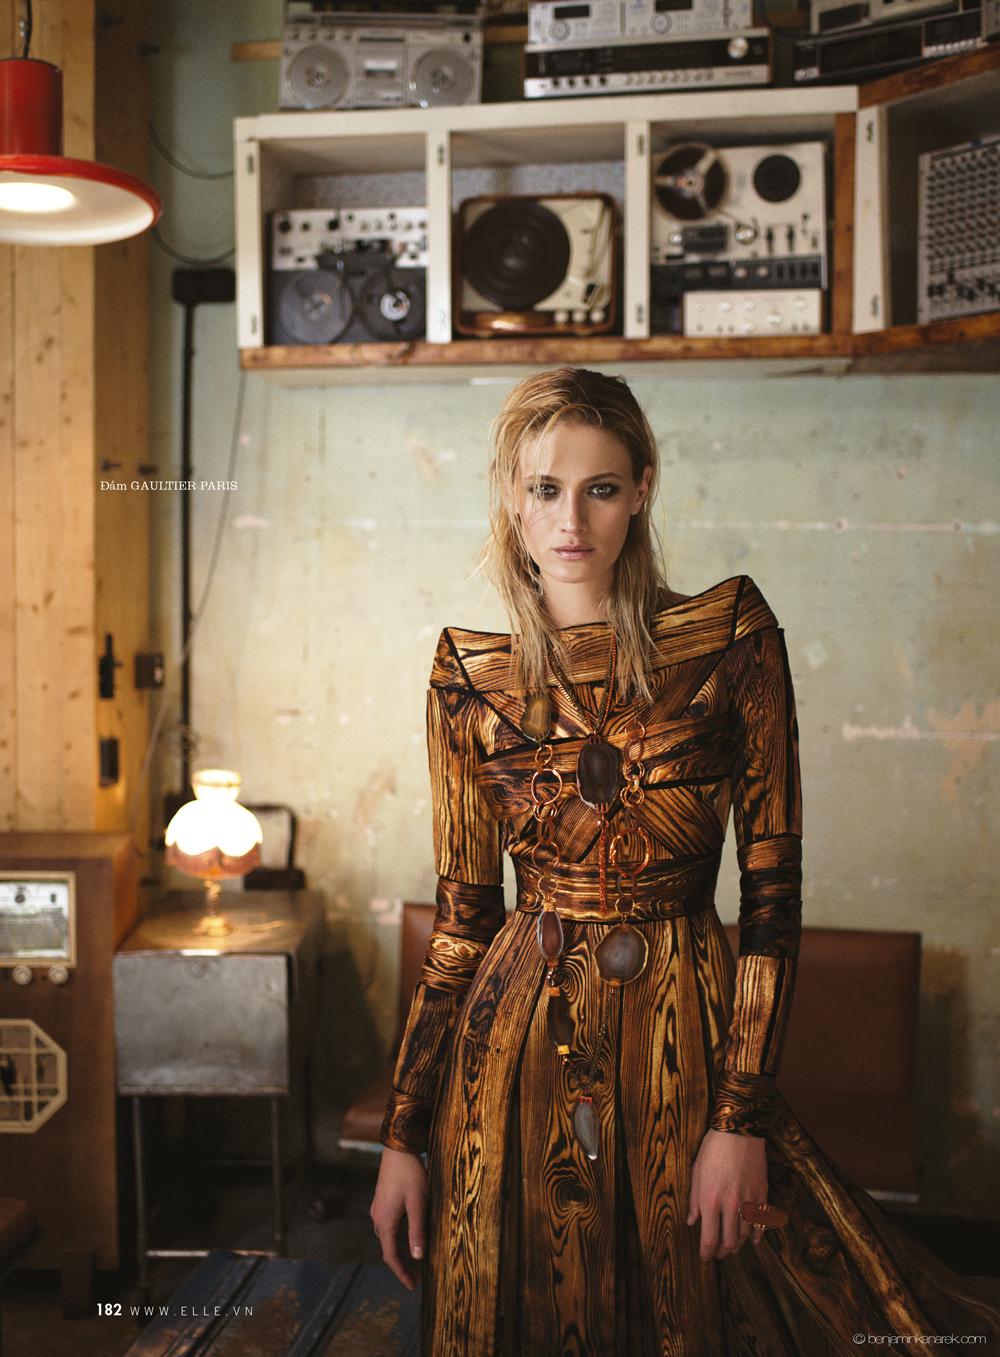 Michelle Buswell Gaultier Paris @ Benjamin Kanarek